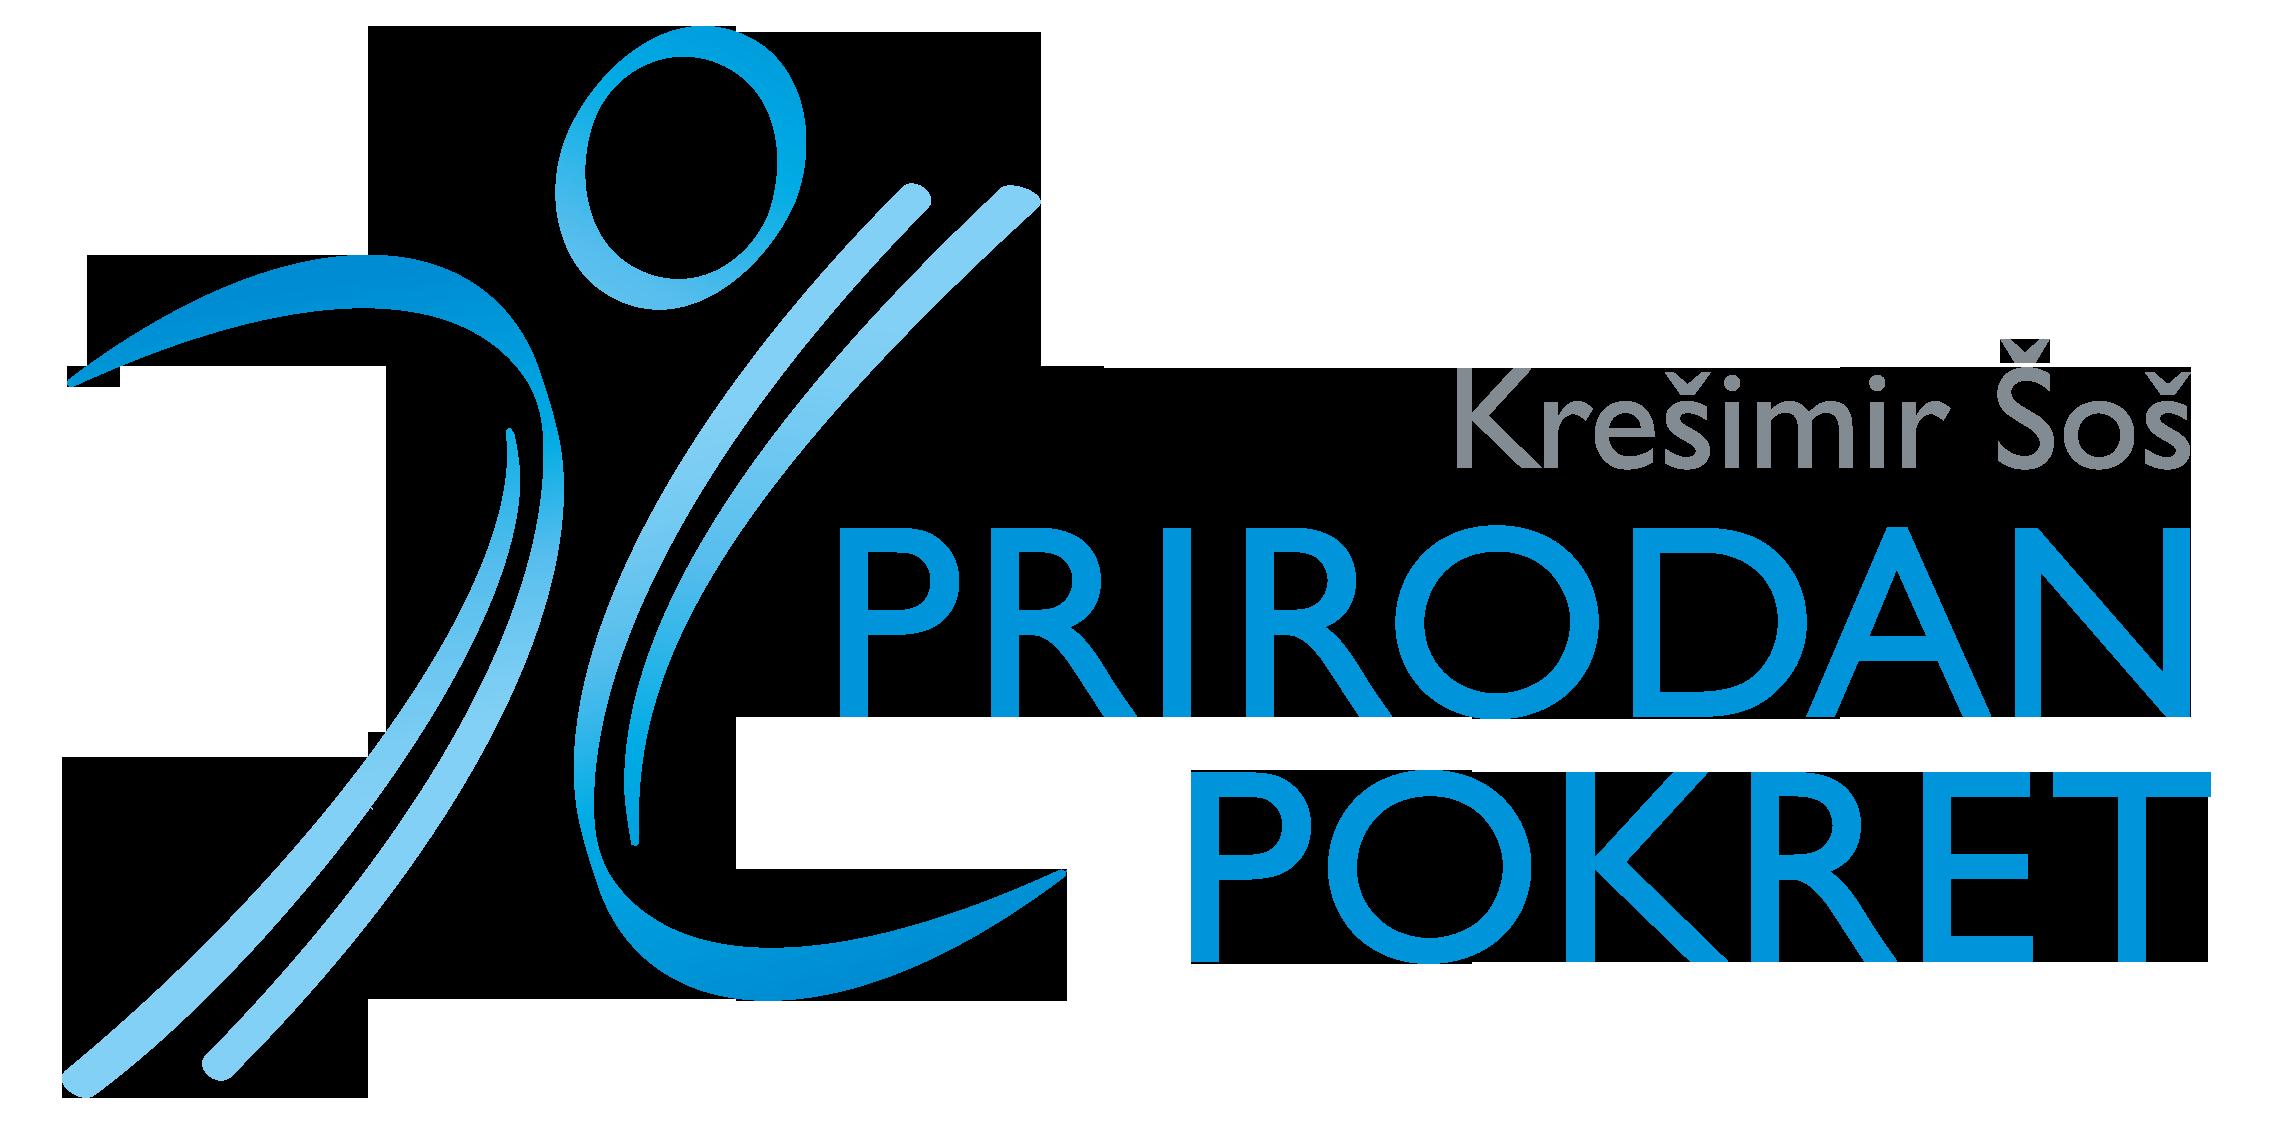 PRIRODAN_POKRET_logo_s_imenom_boja